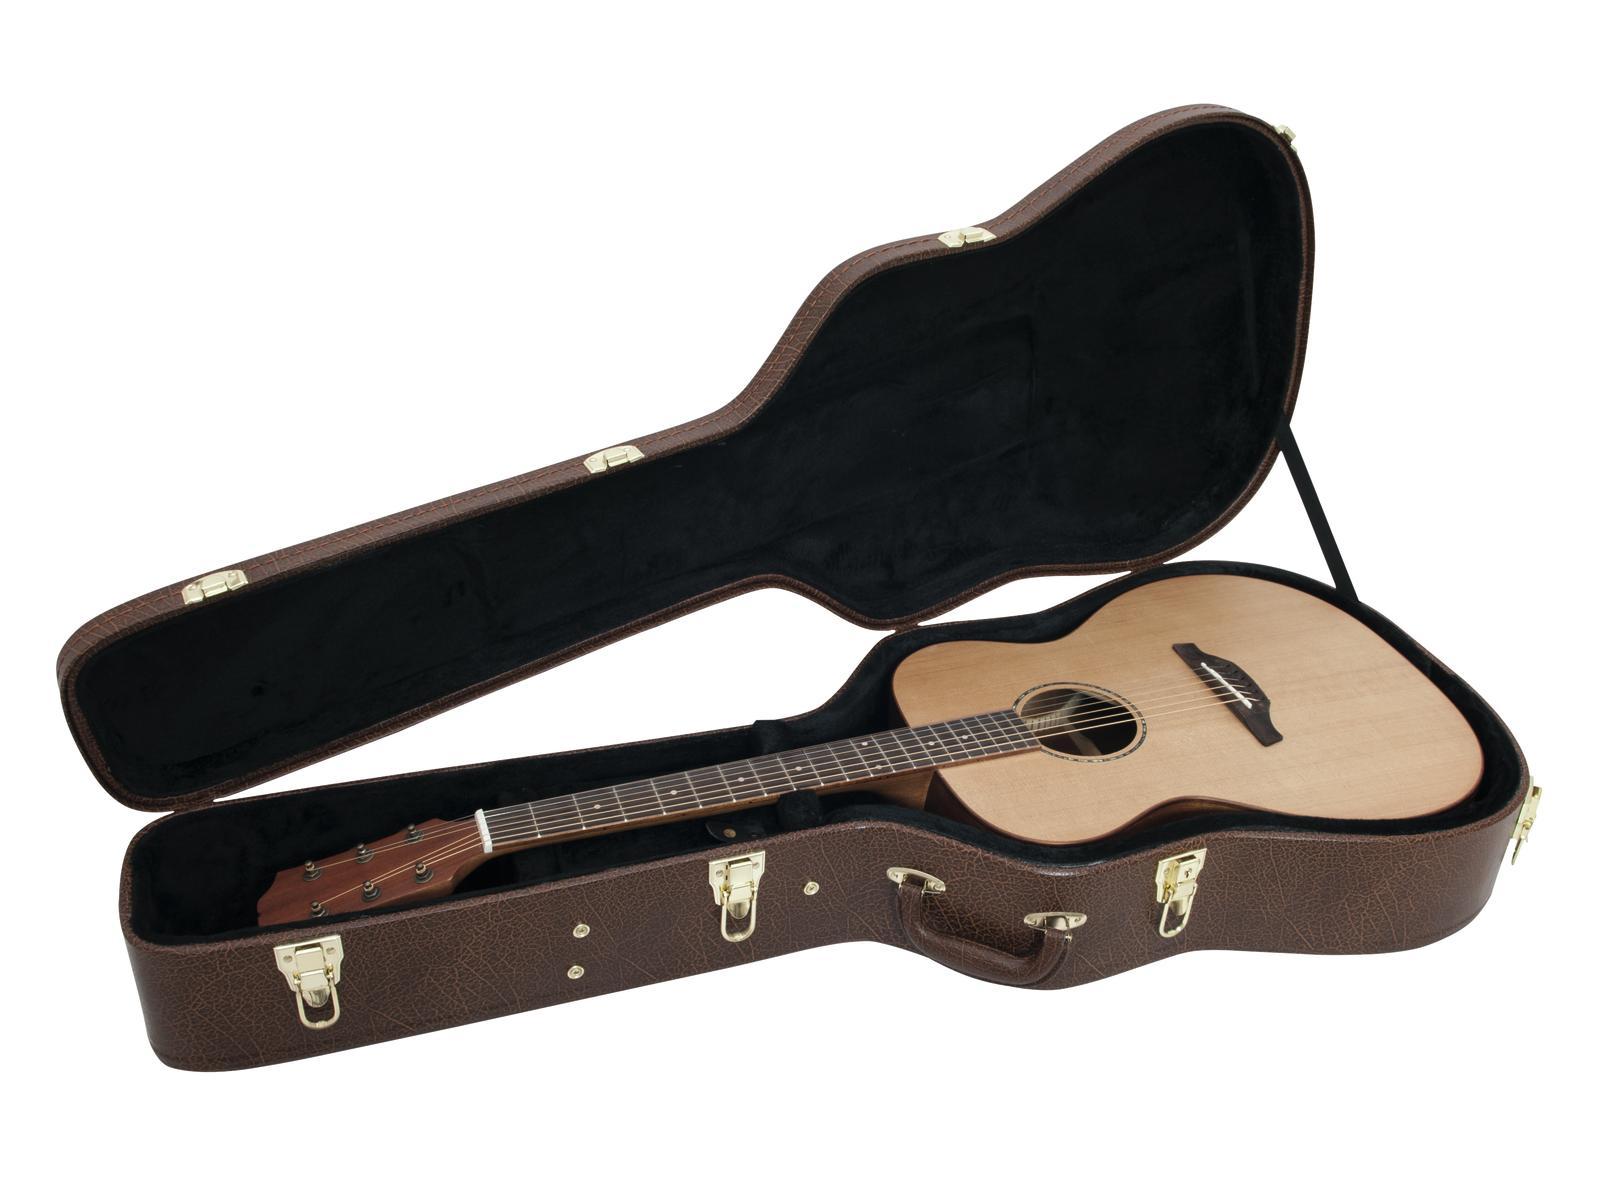 Borsa Custodia Bag sagomata per chitarra acustica Dimavery